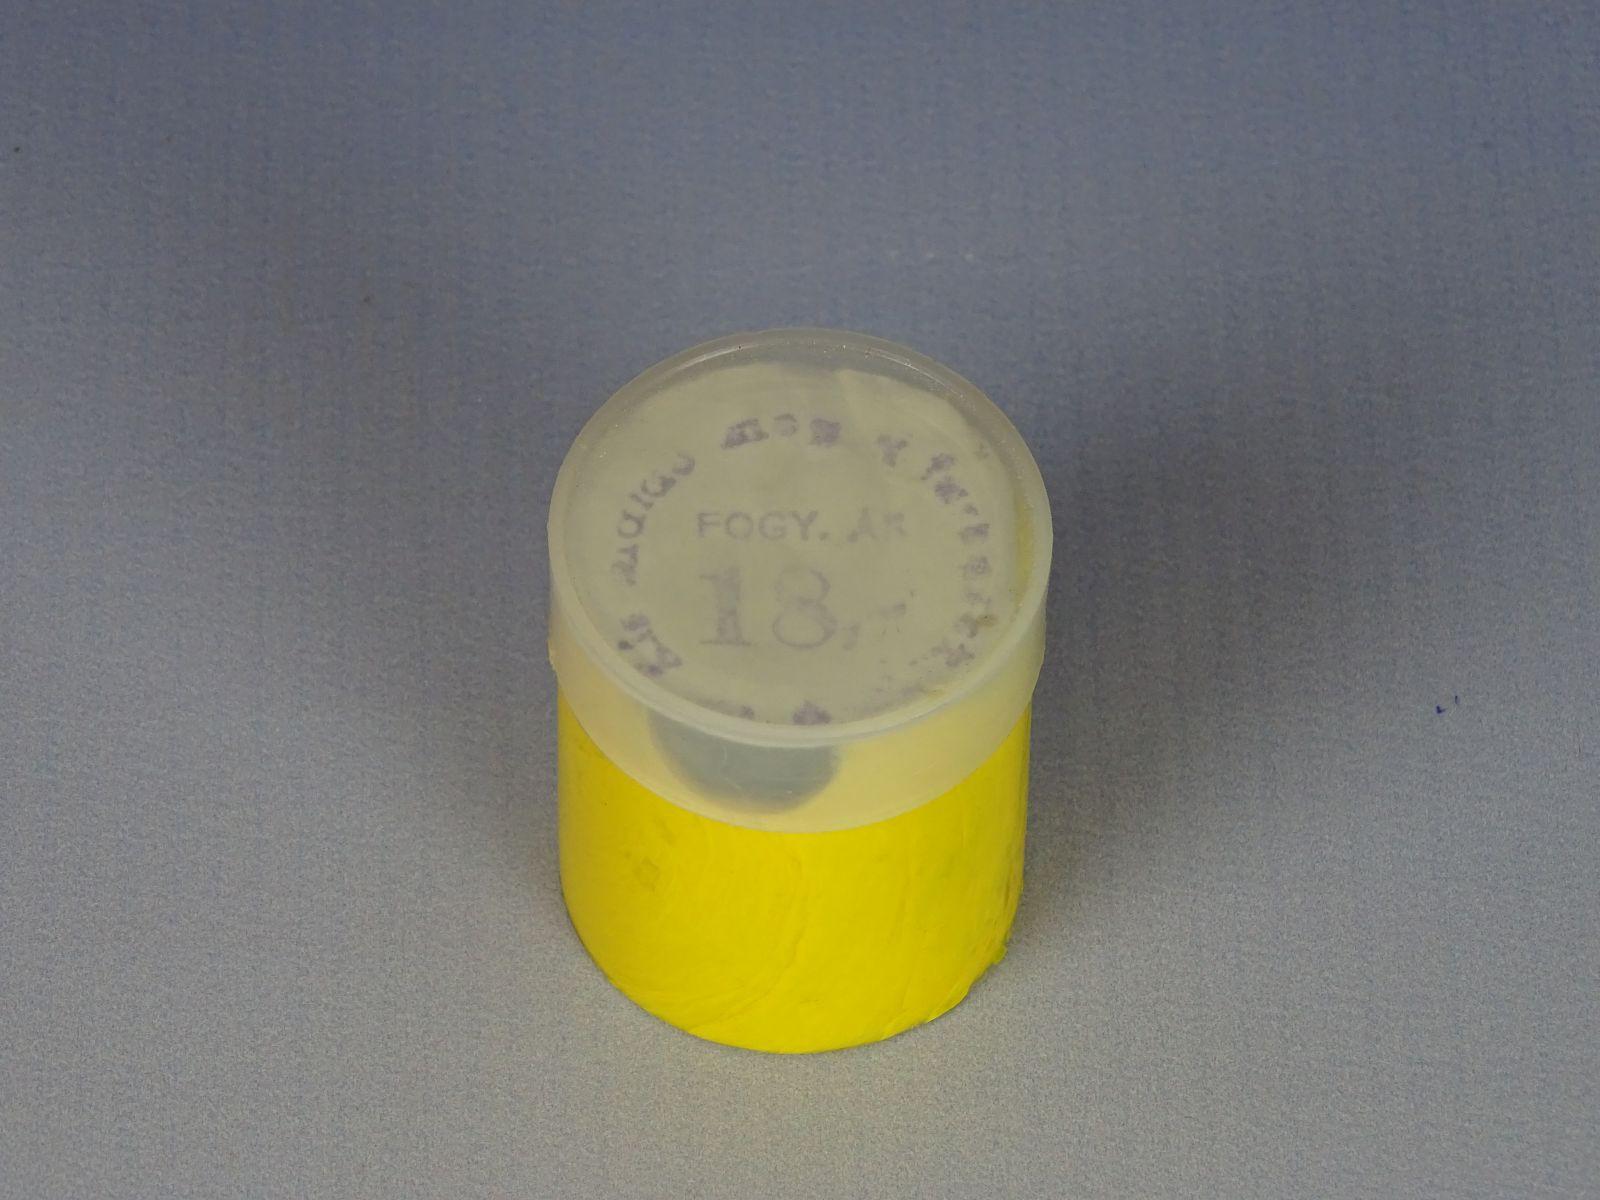 DSC06846.JPG (1600�1200)